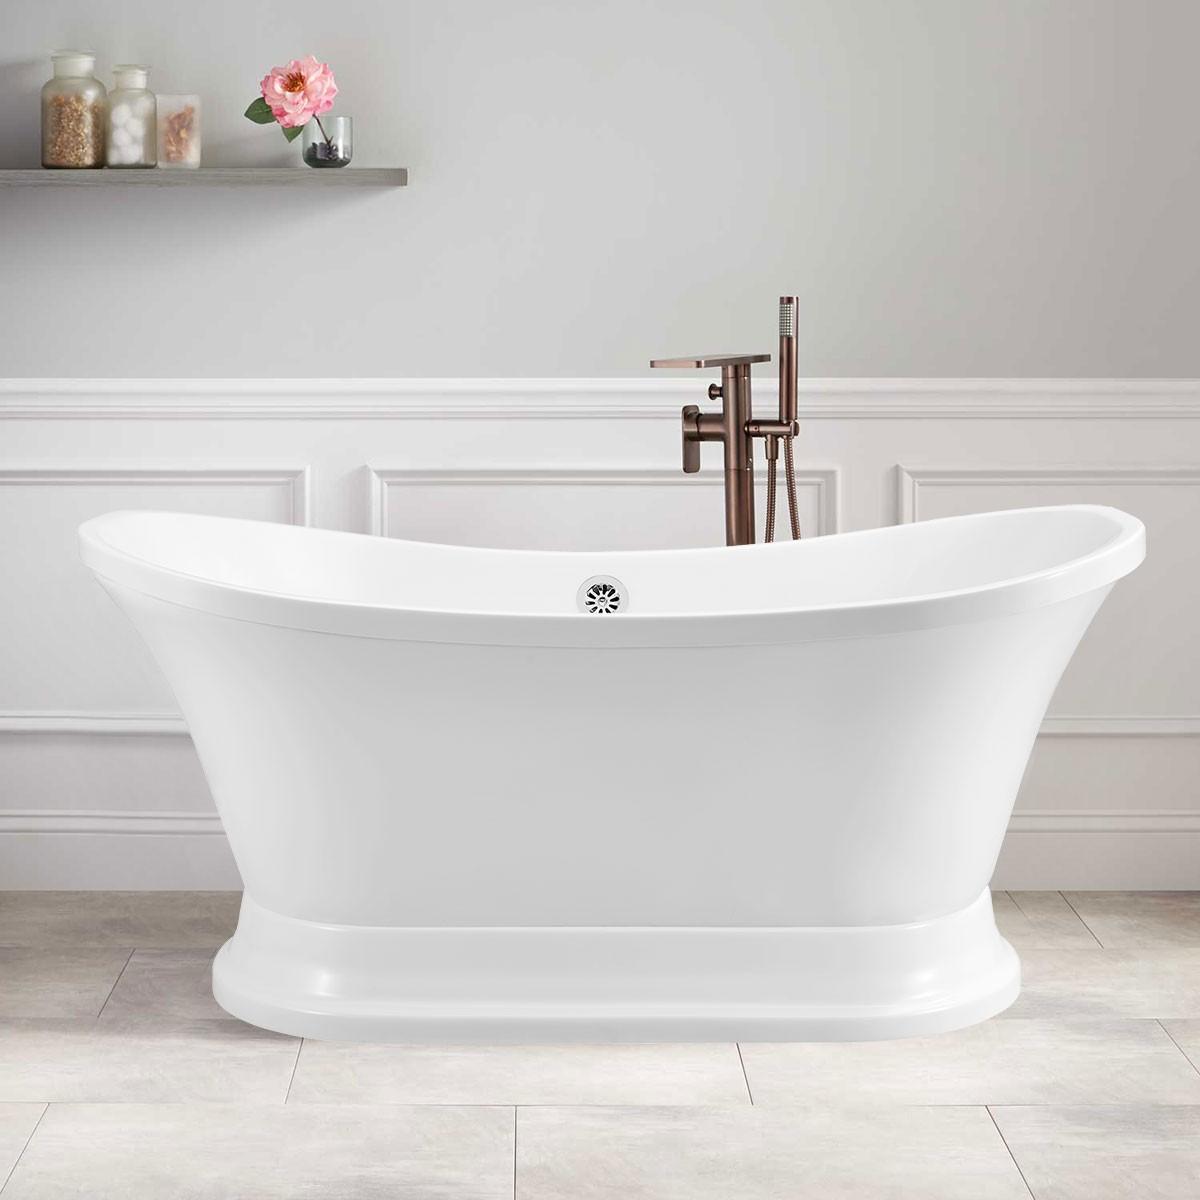 60 In Freestanding Bathtub - Acrylic Pure White (DK-PW-A52603)